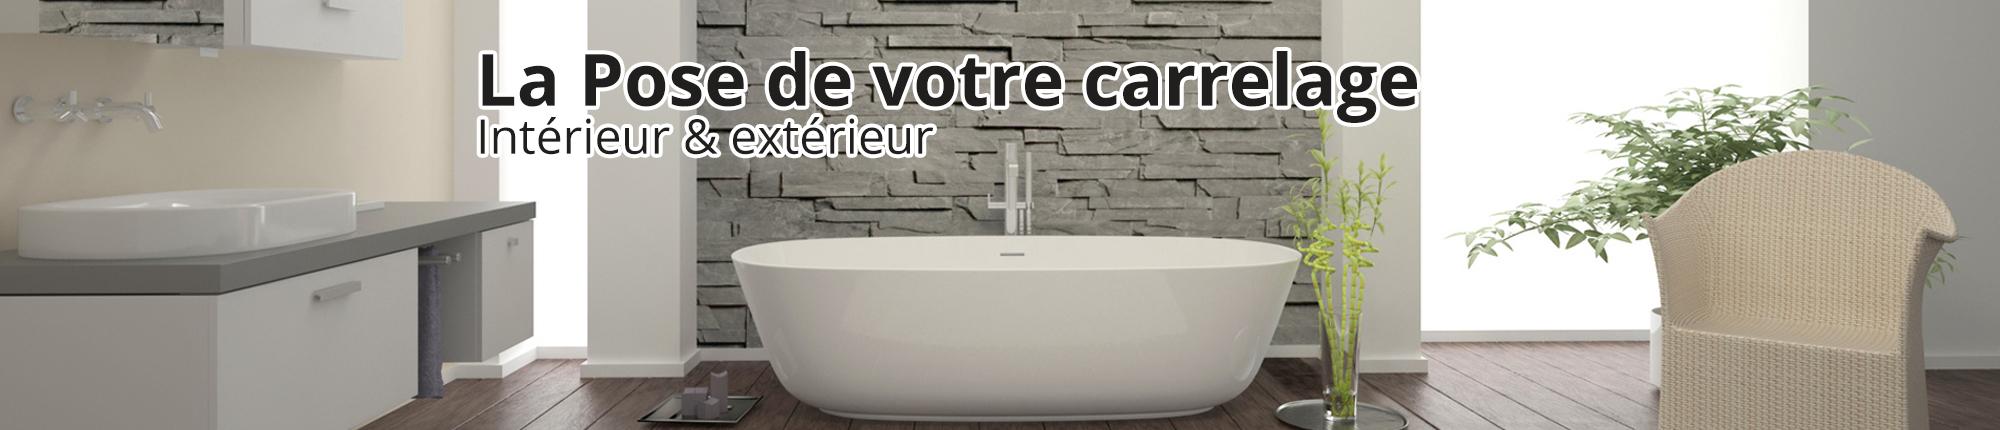 Carreleur Pose De Carrelage Chantilly Oise